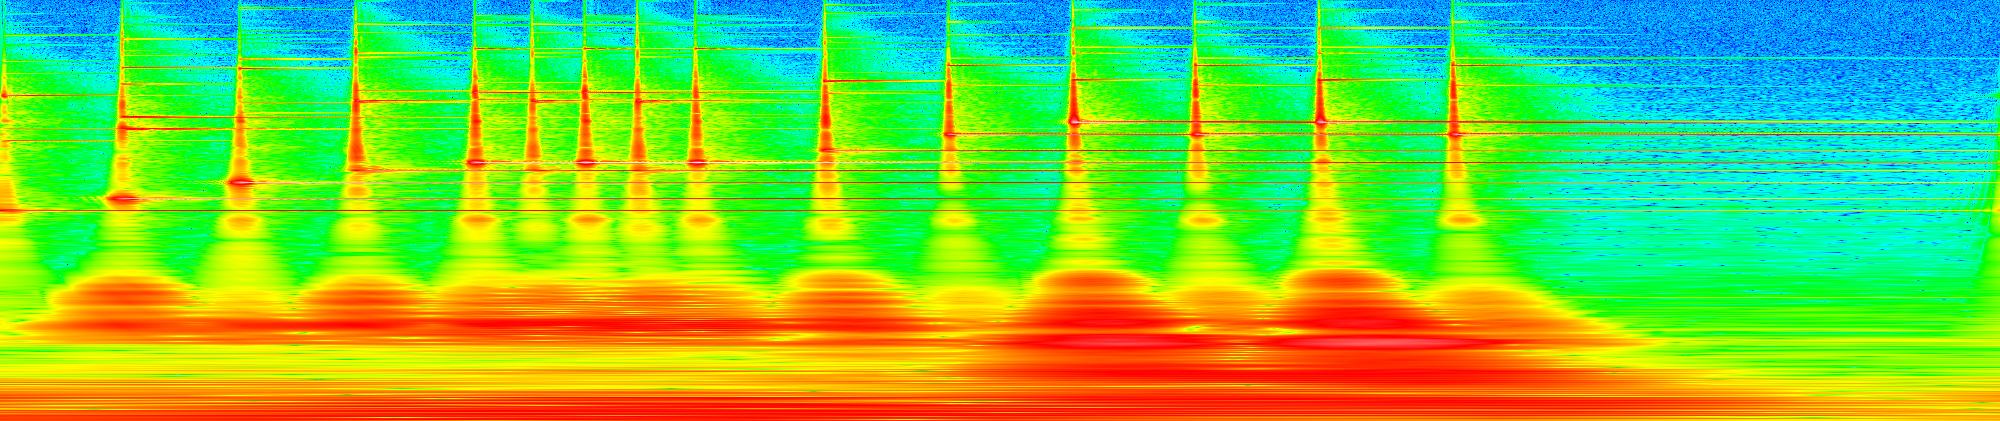 Glockenspiel spectrogram, decibel scaled